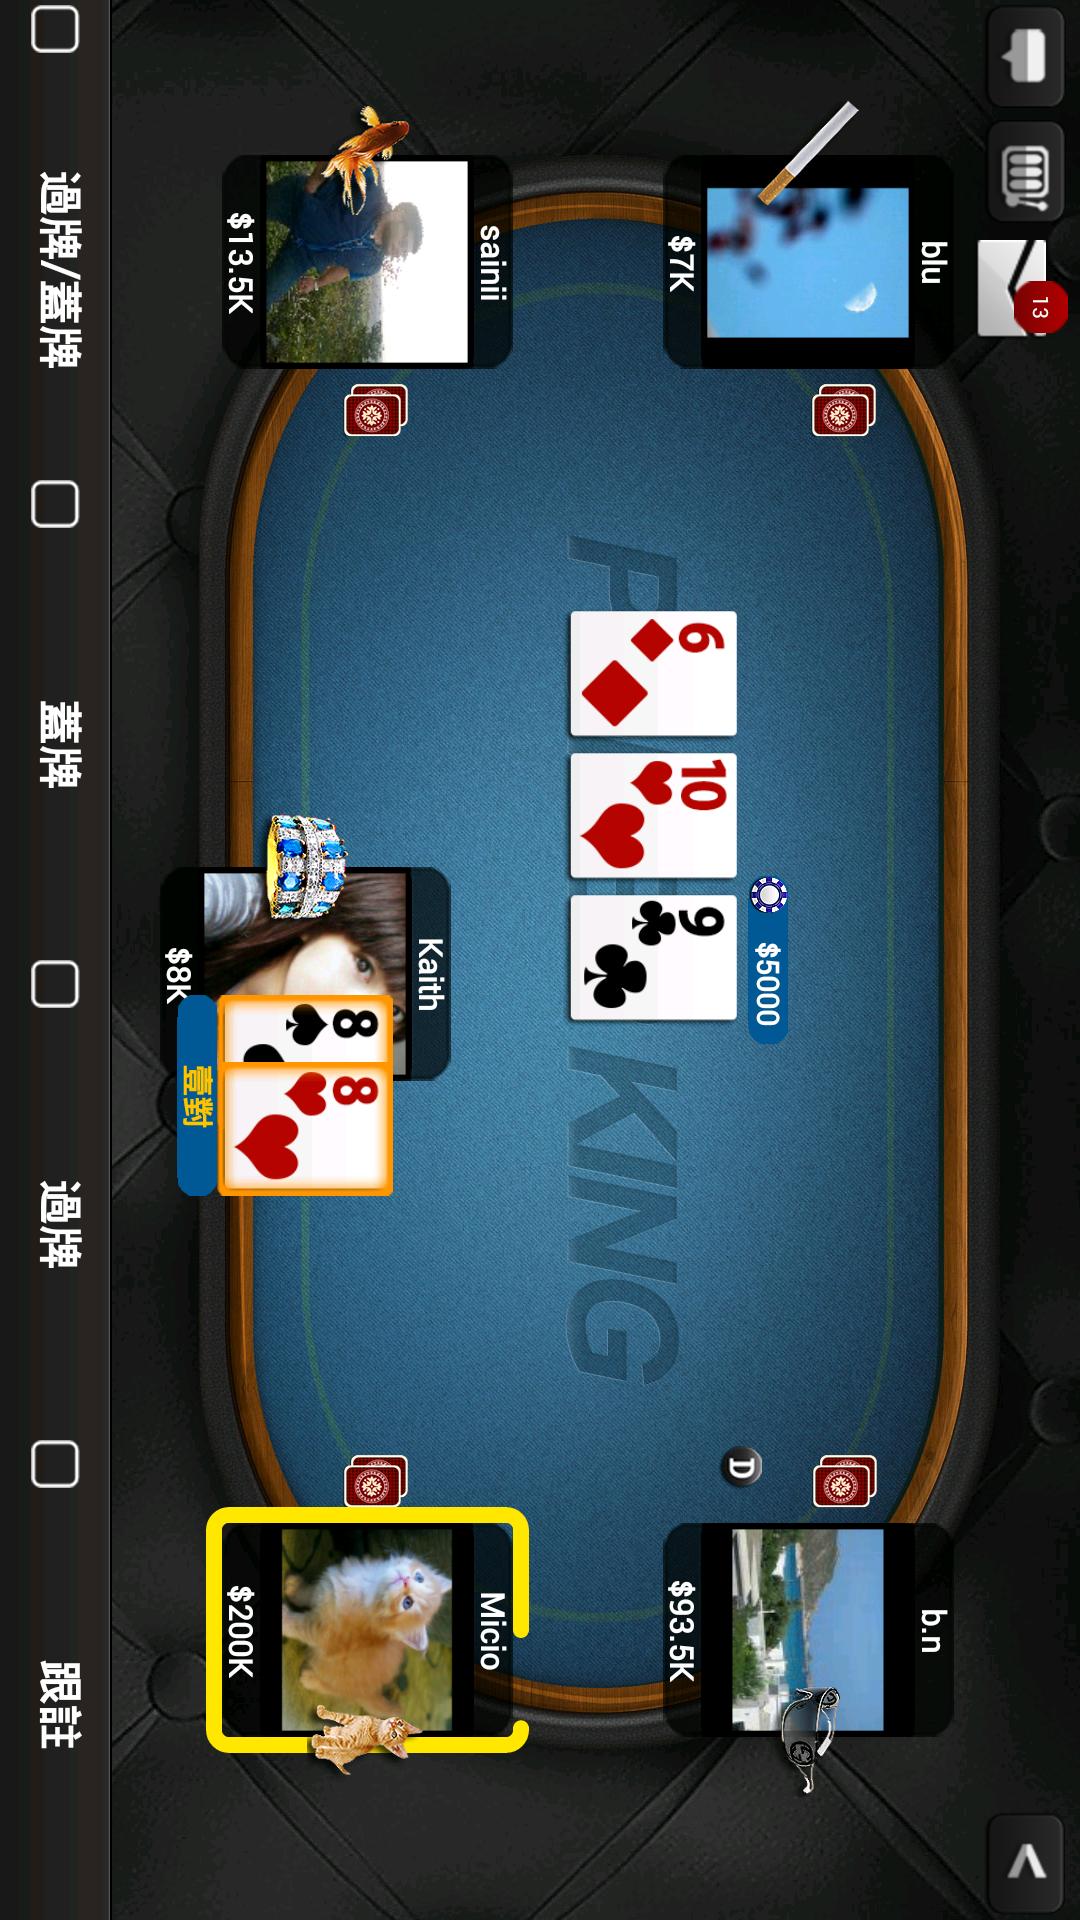 Strip Poker Texas Holdem Jemma App Ranking and Store Data ...